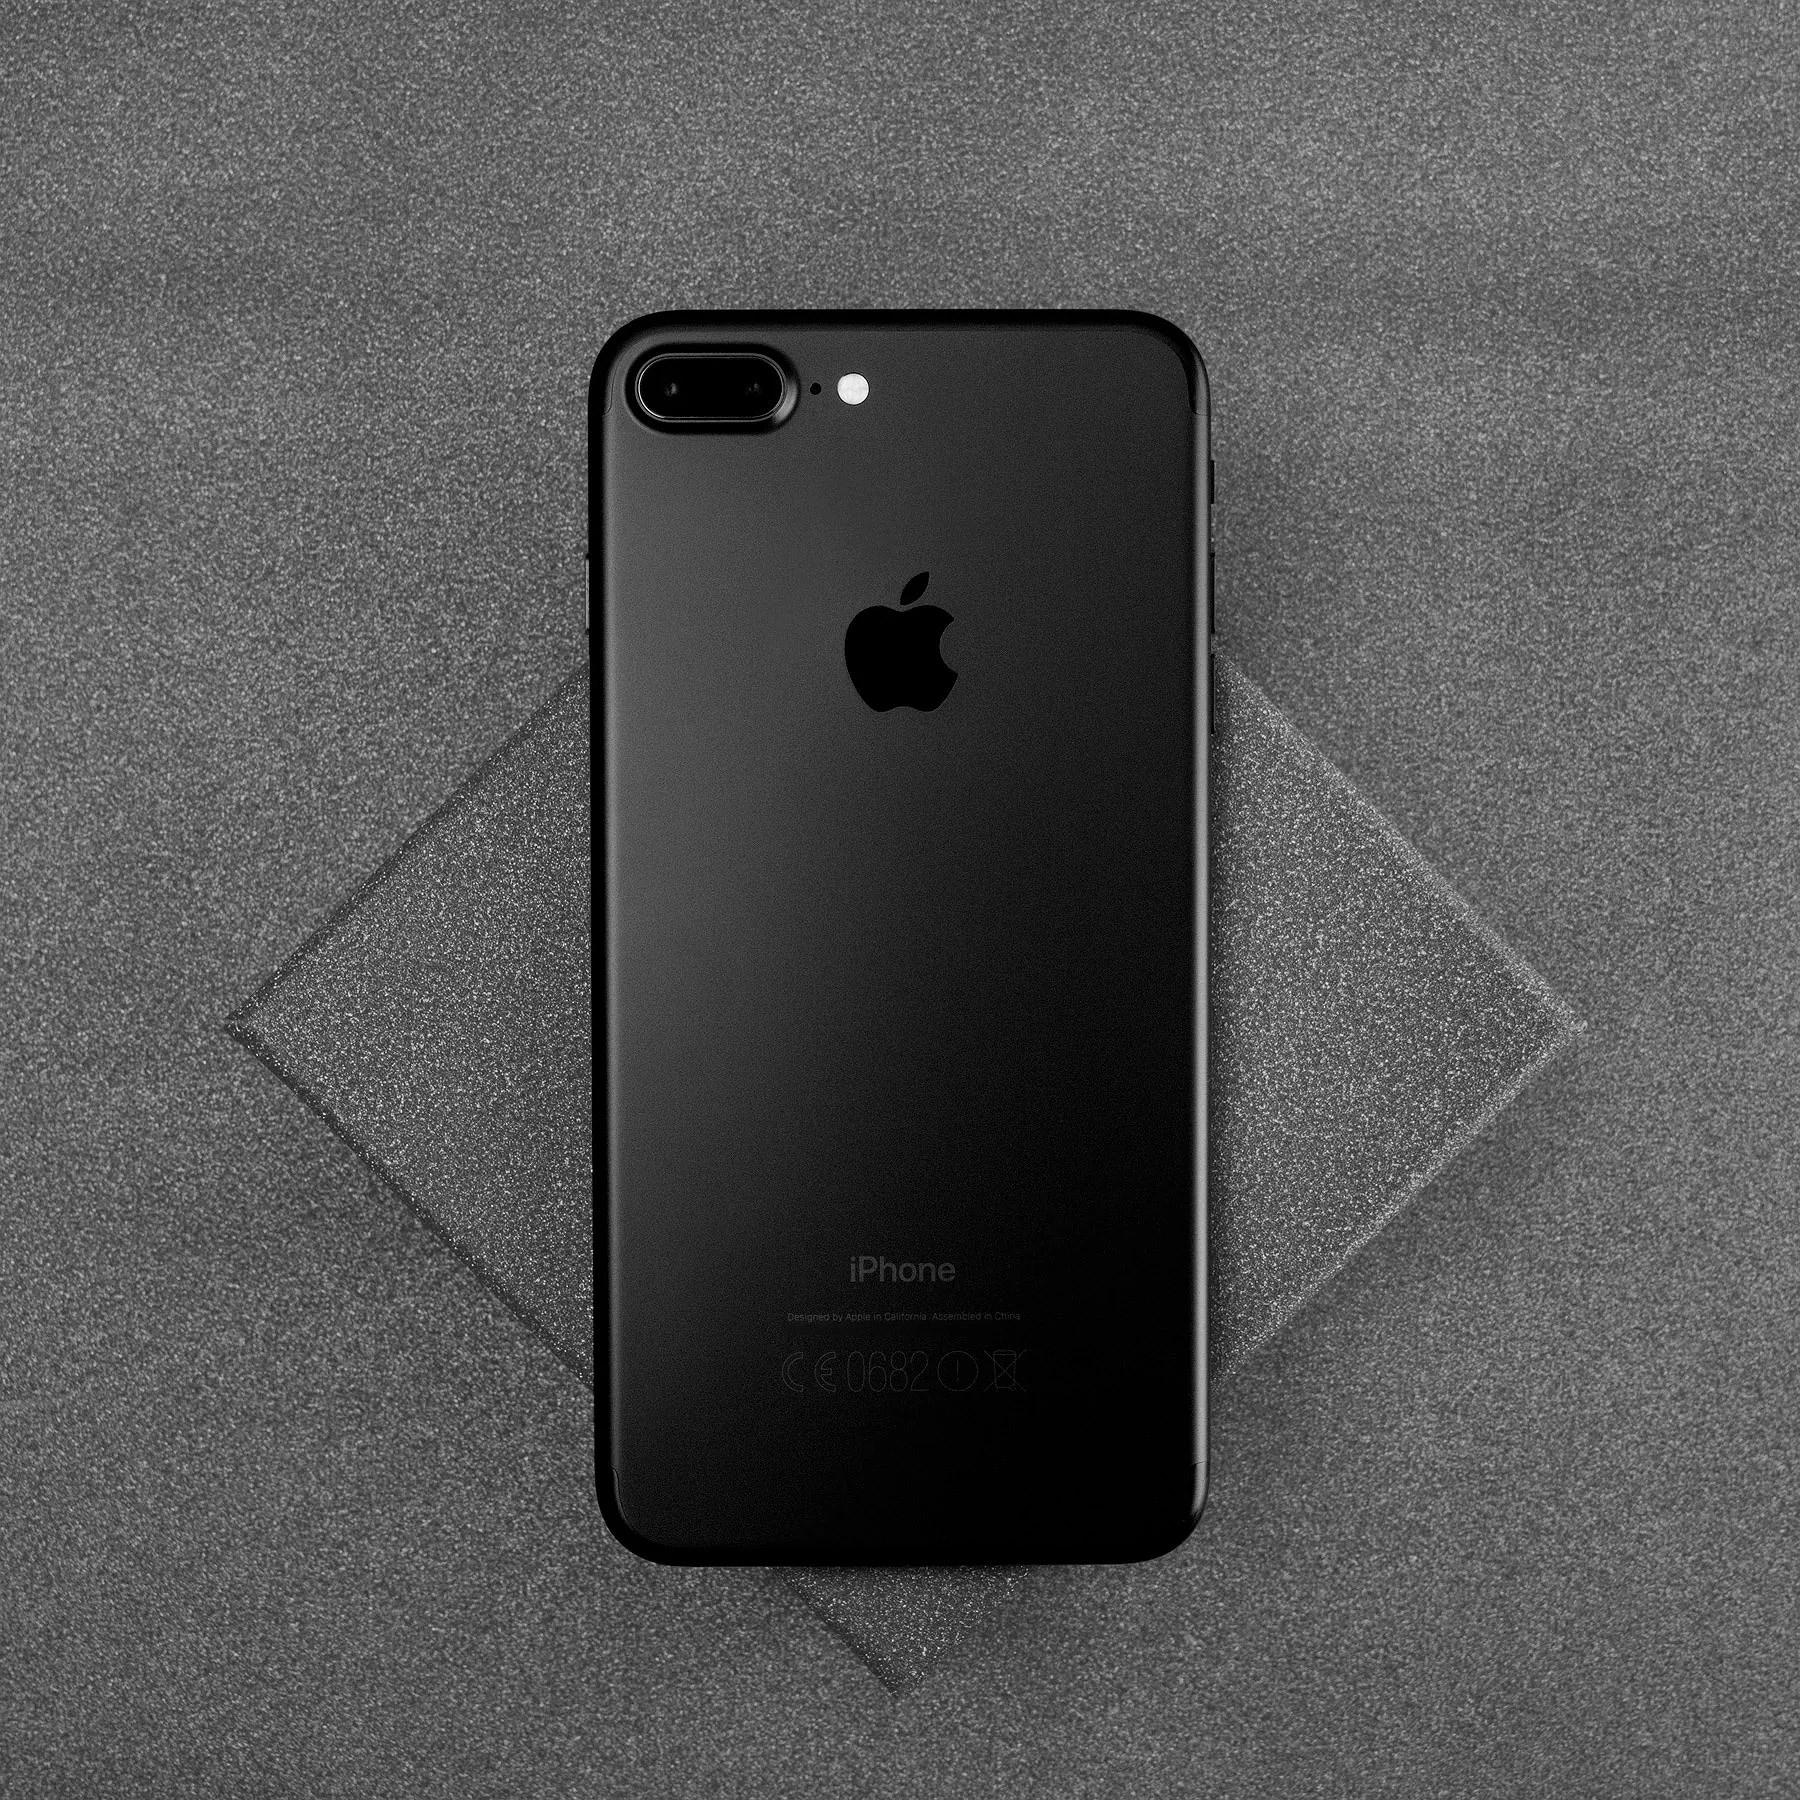 It's black & clean